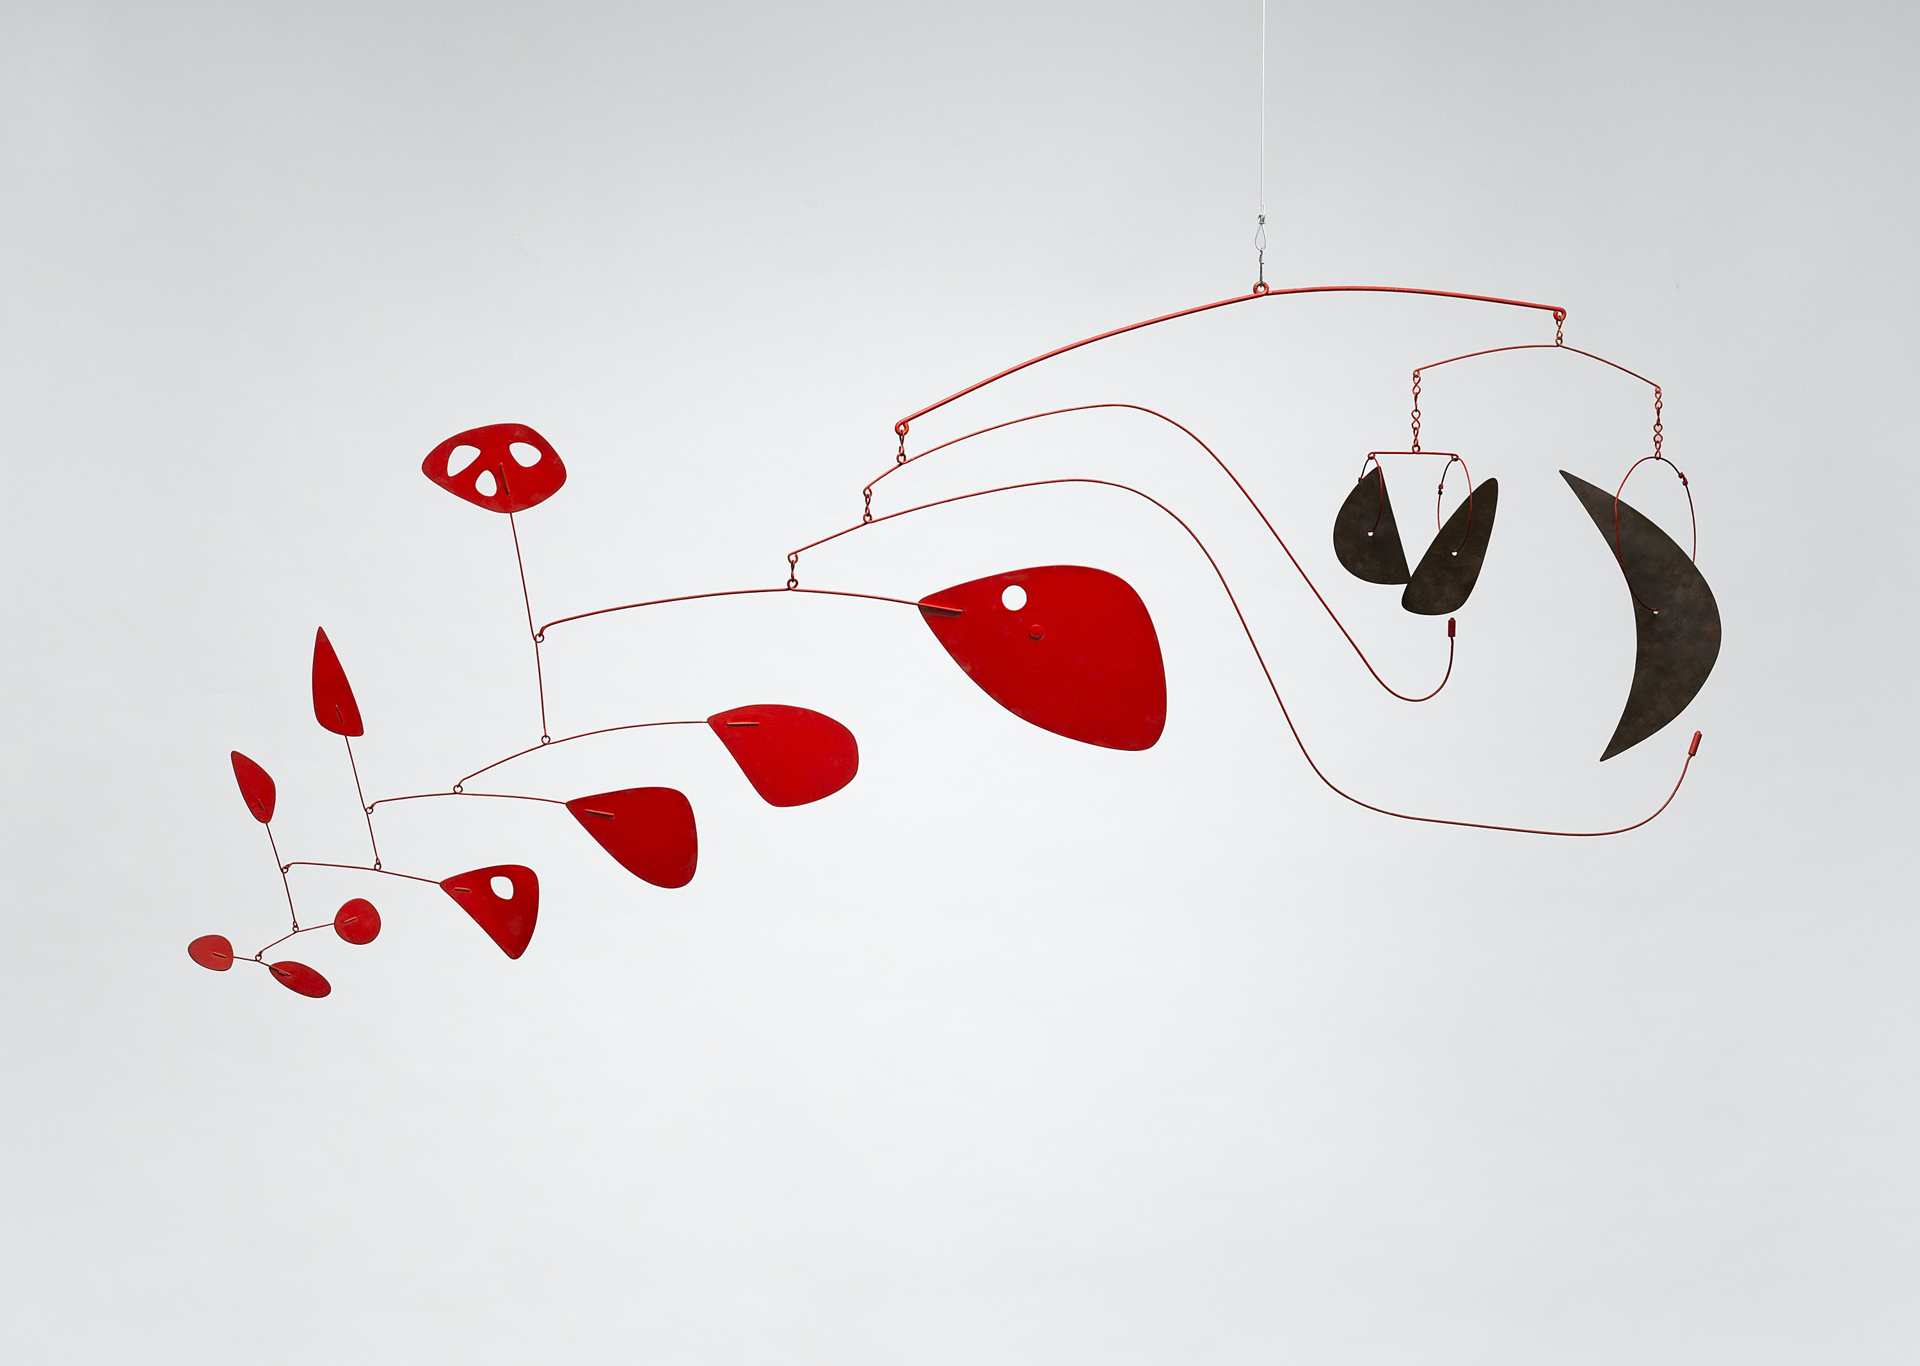 Alexander Calder: Radical Inventor is a tribute to living, breathing works of art